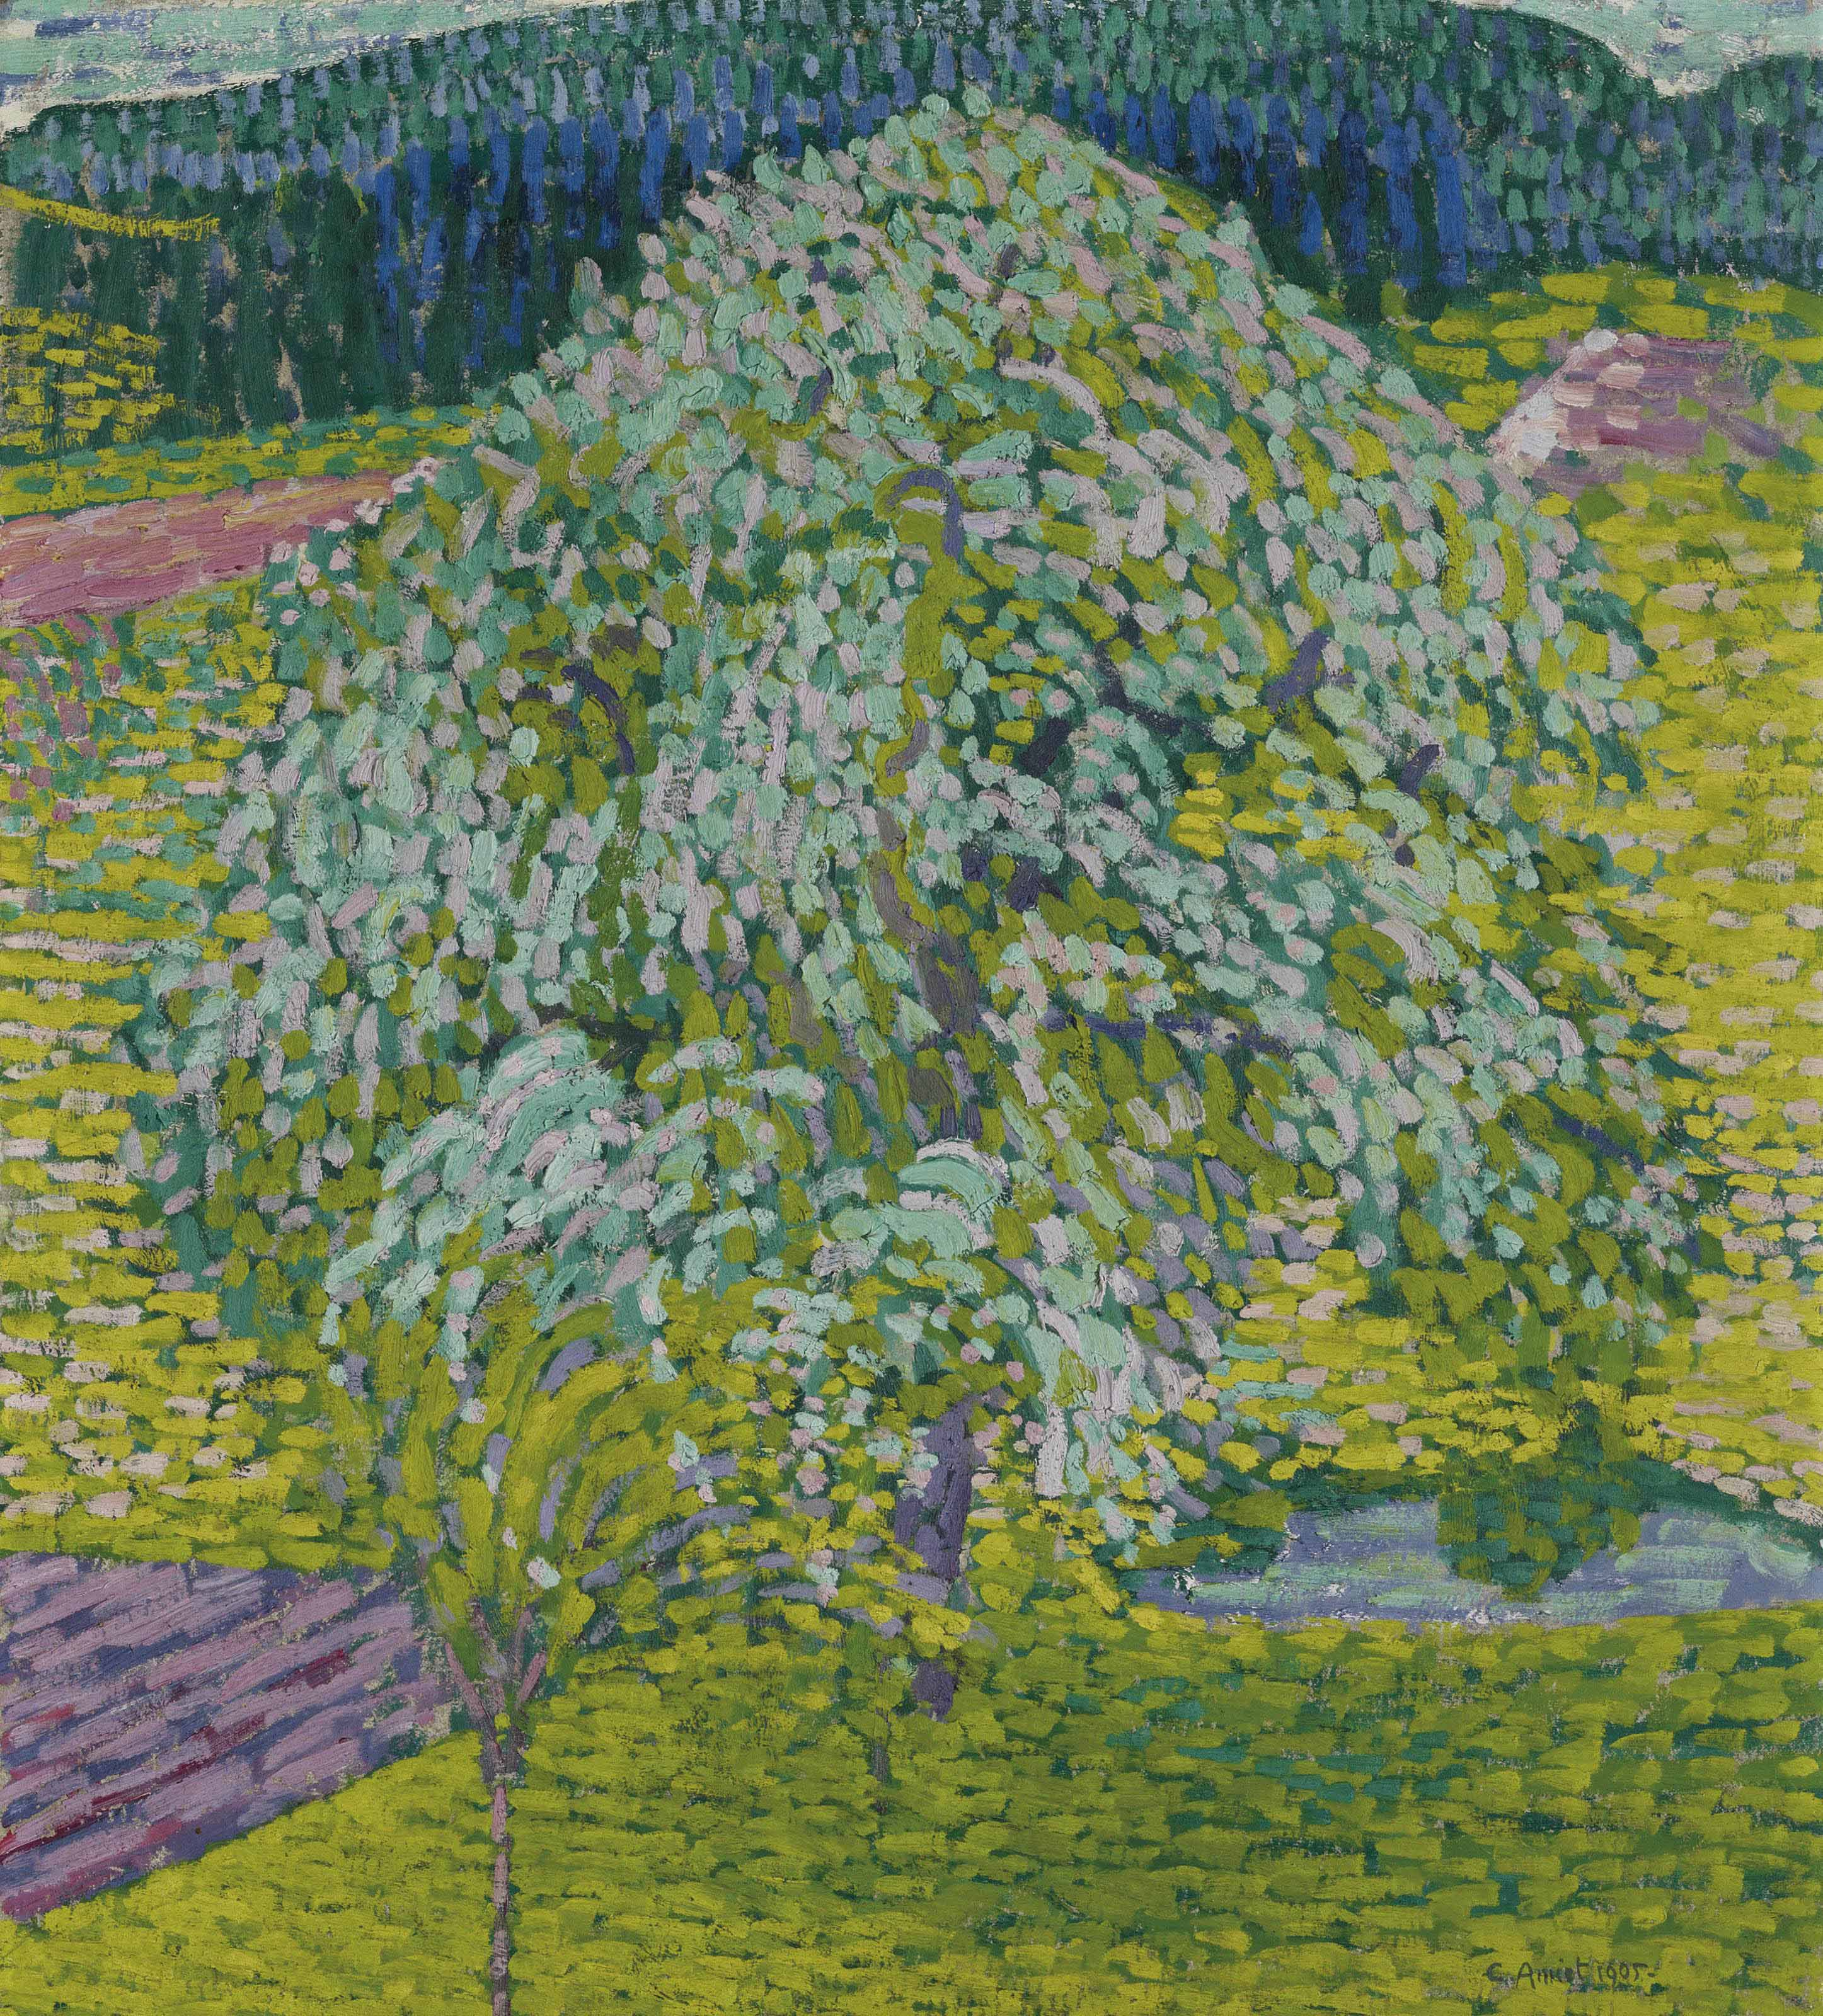 Blühender Obstbaum in Frühlingslandschaft, 1905